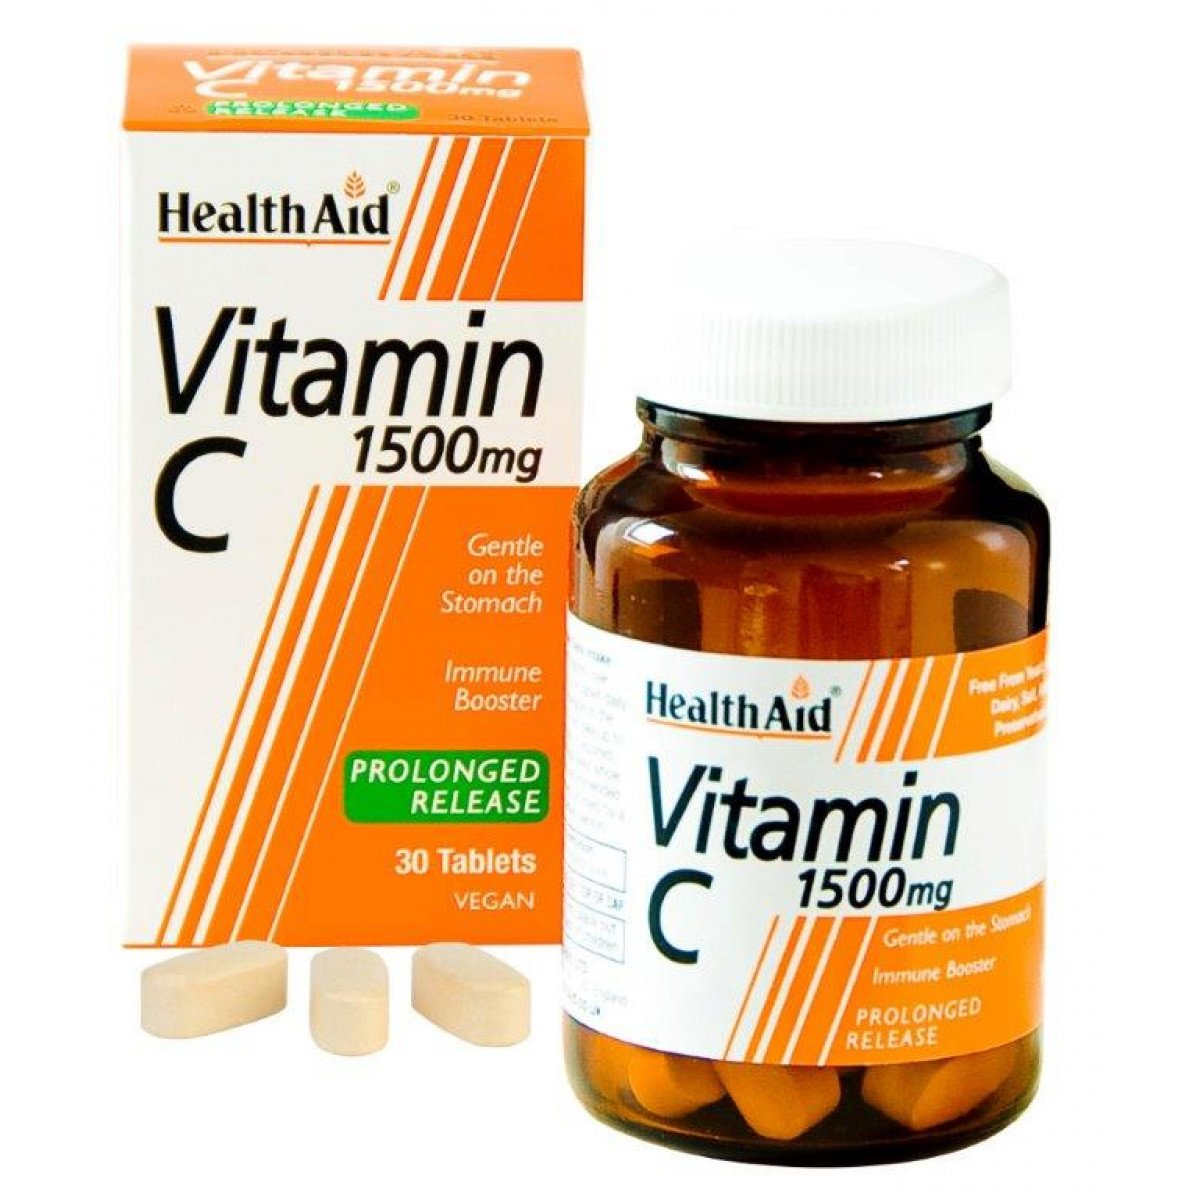 Health Aid Vitamin C 1500mg Prolonged Release, Βιταμίνη C Βραδείας Αποδέσμευσης για Εύκολη Απορρόφηση 30tabs